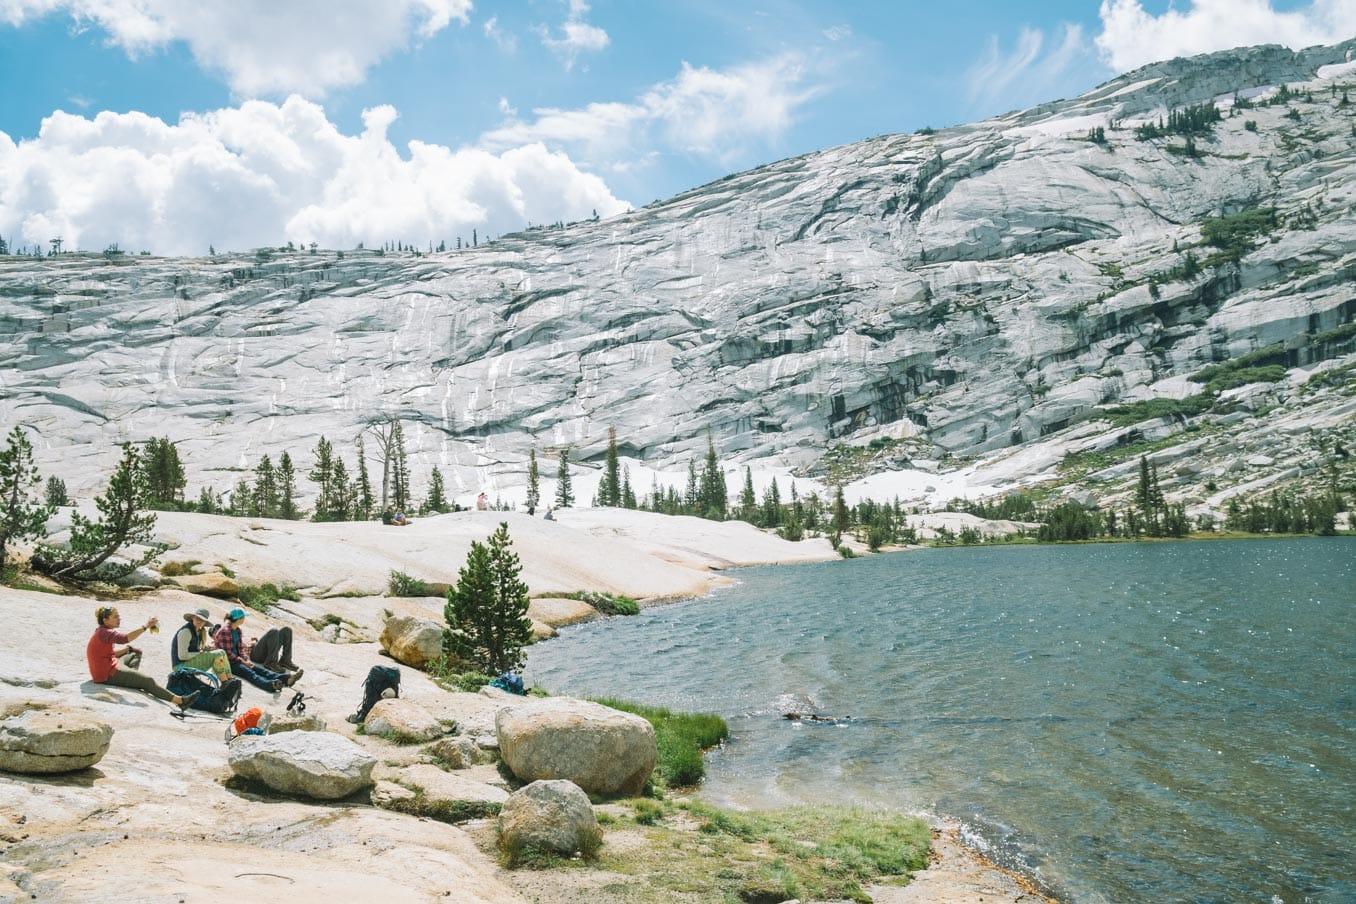 Backpacking tour group rests beside Yosemite lake